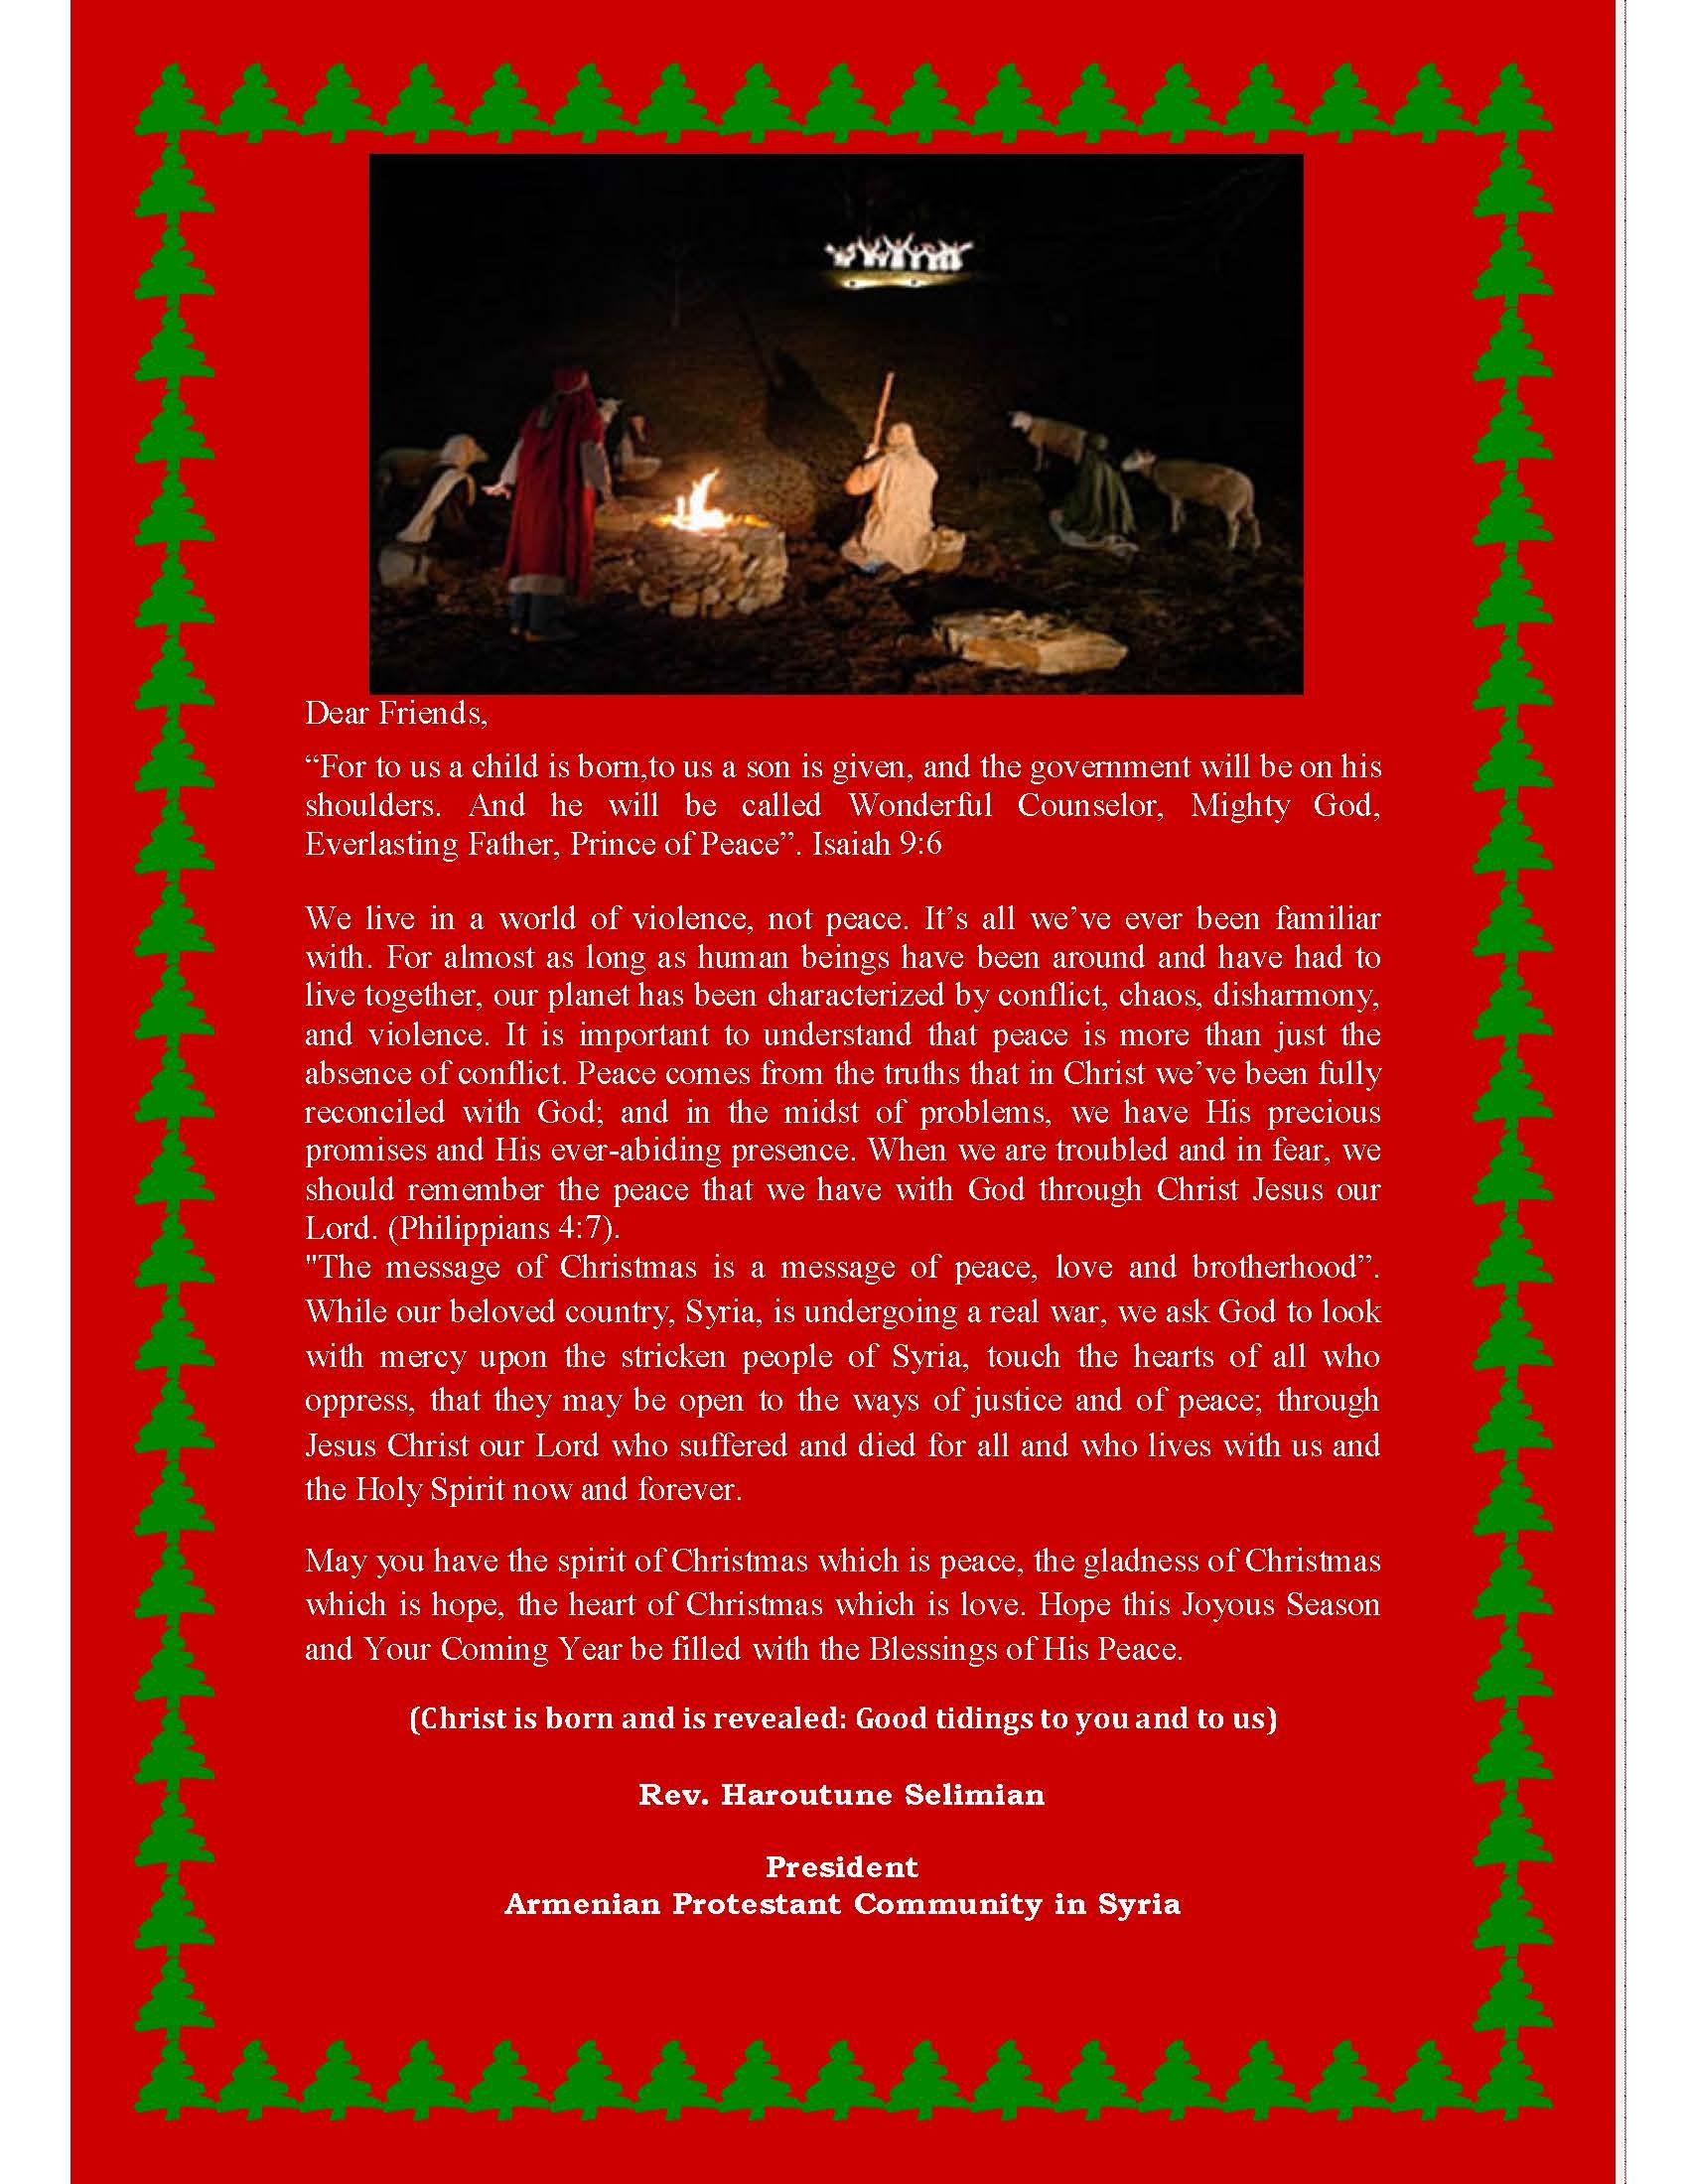 Christmas Greetings From Aleppo Syria Armenian Missionary